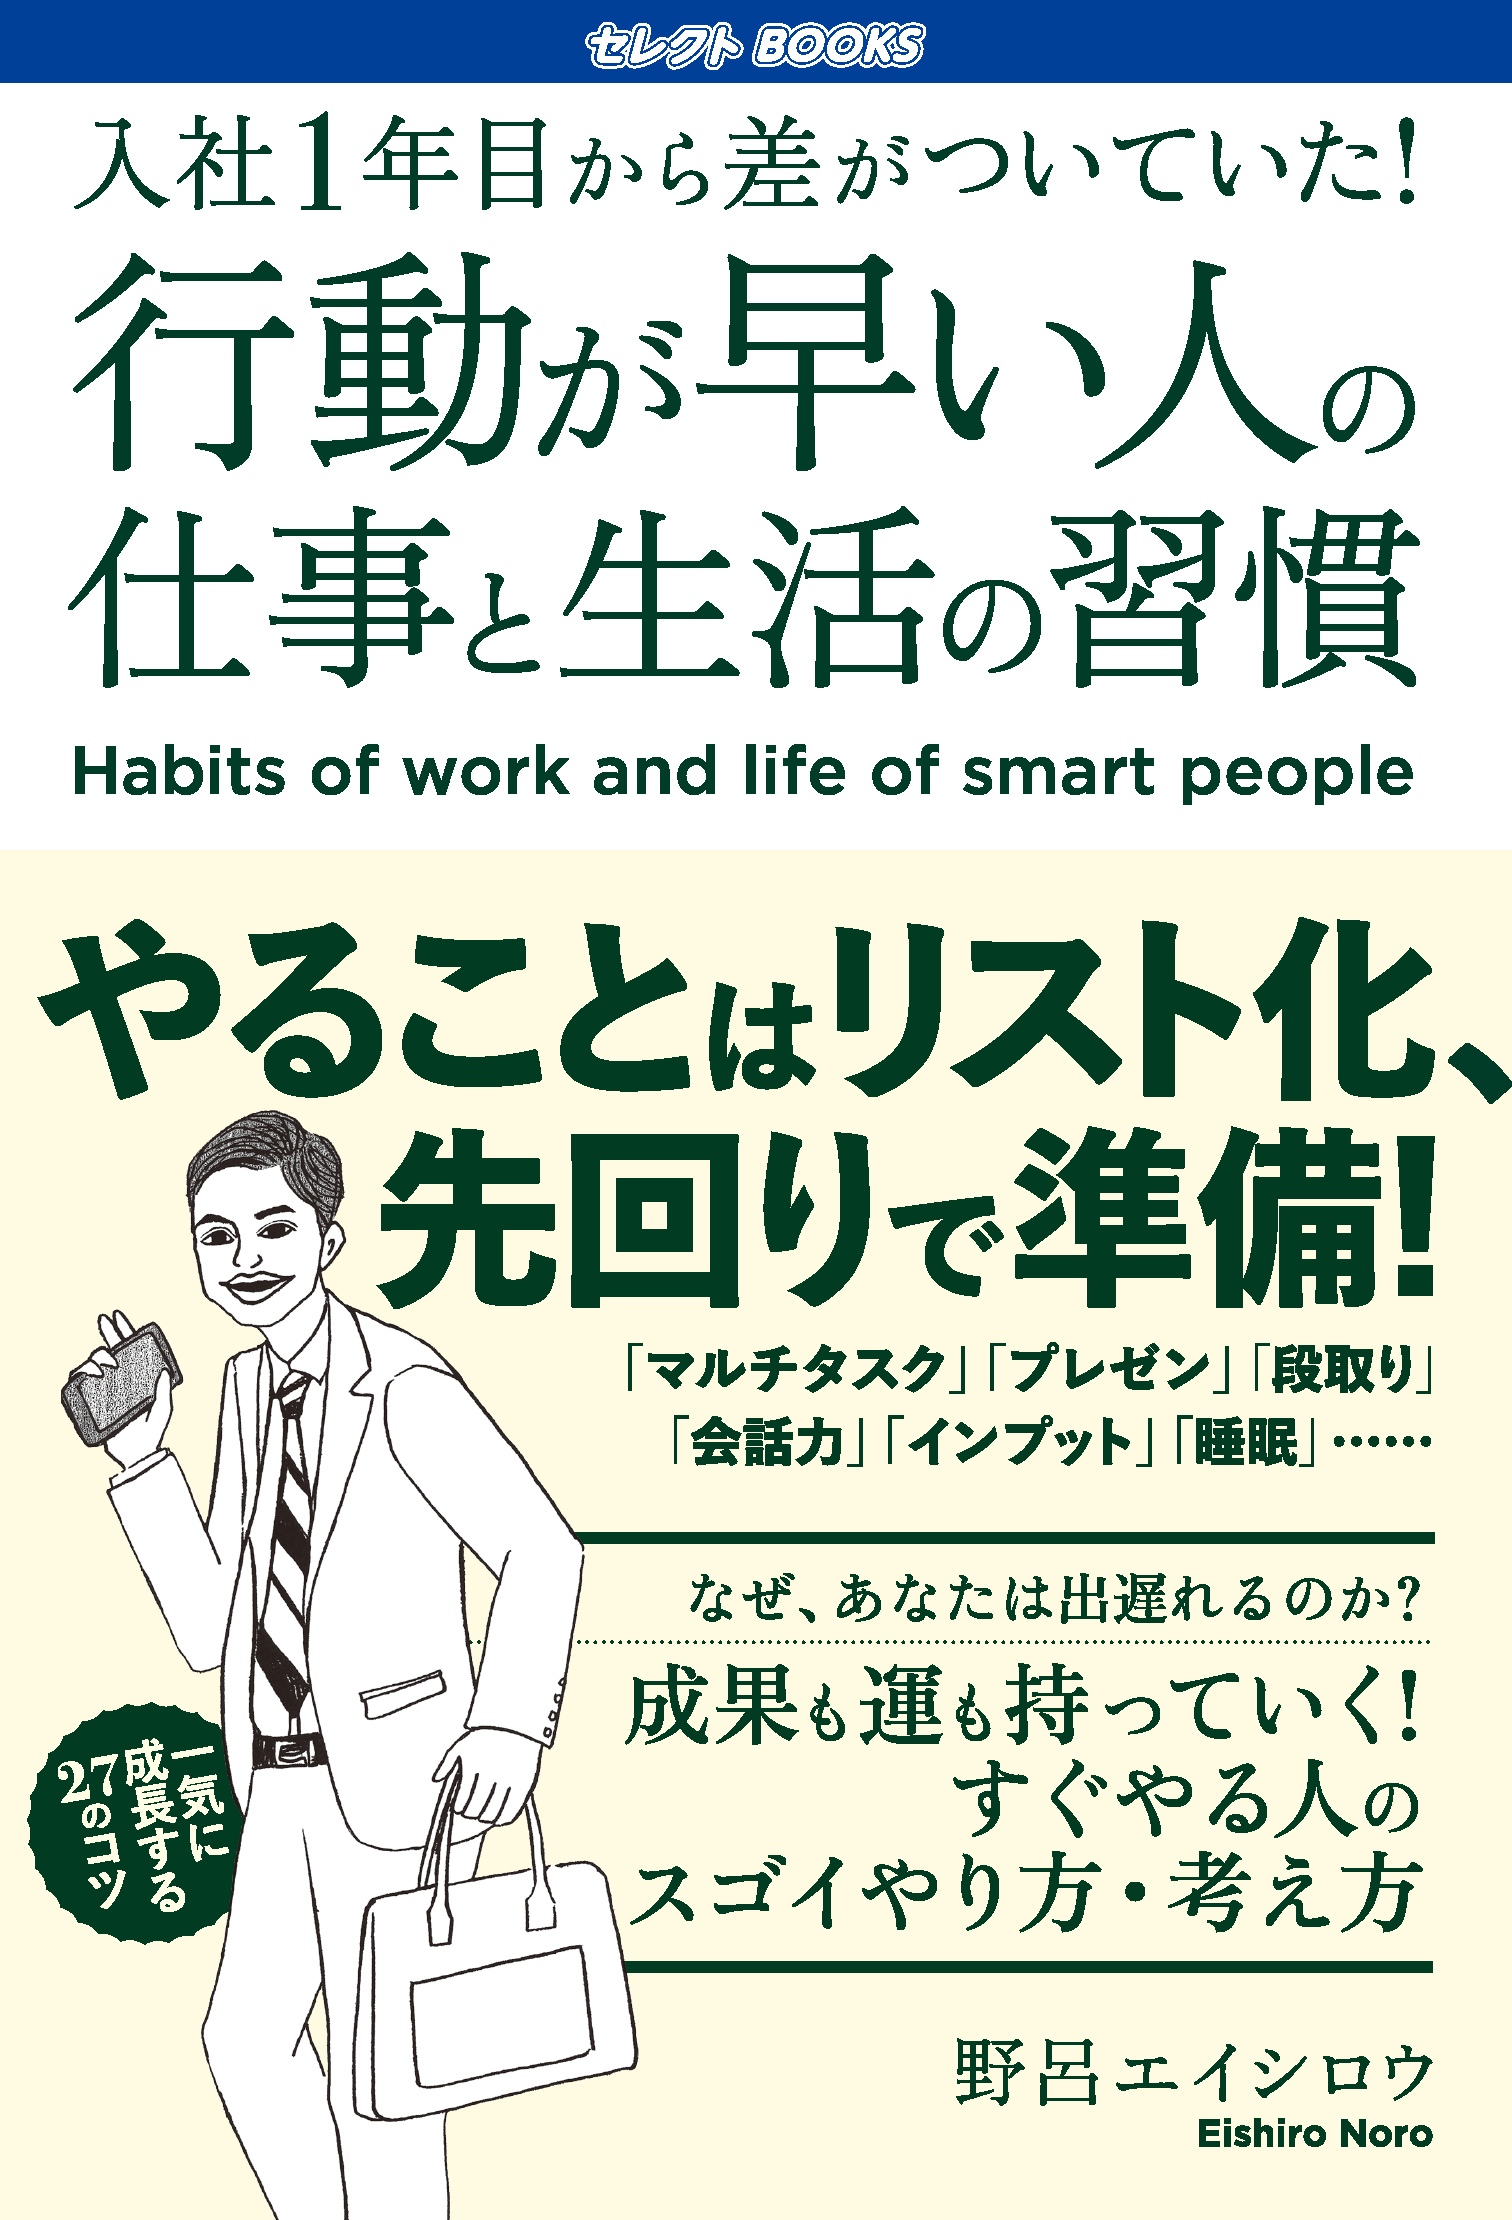 【FM】行動が早い人の仕事と生活の習慣(書影)